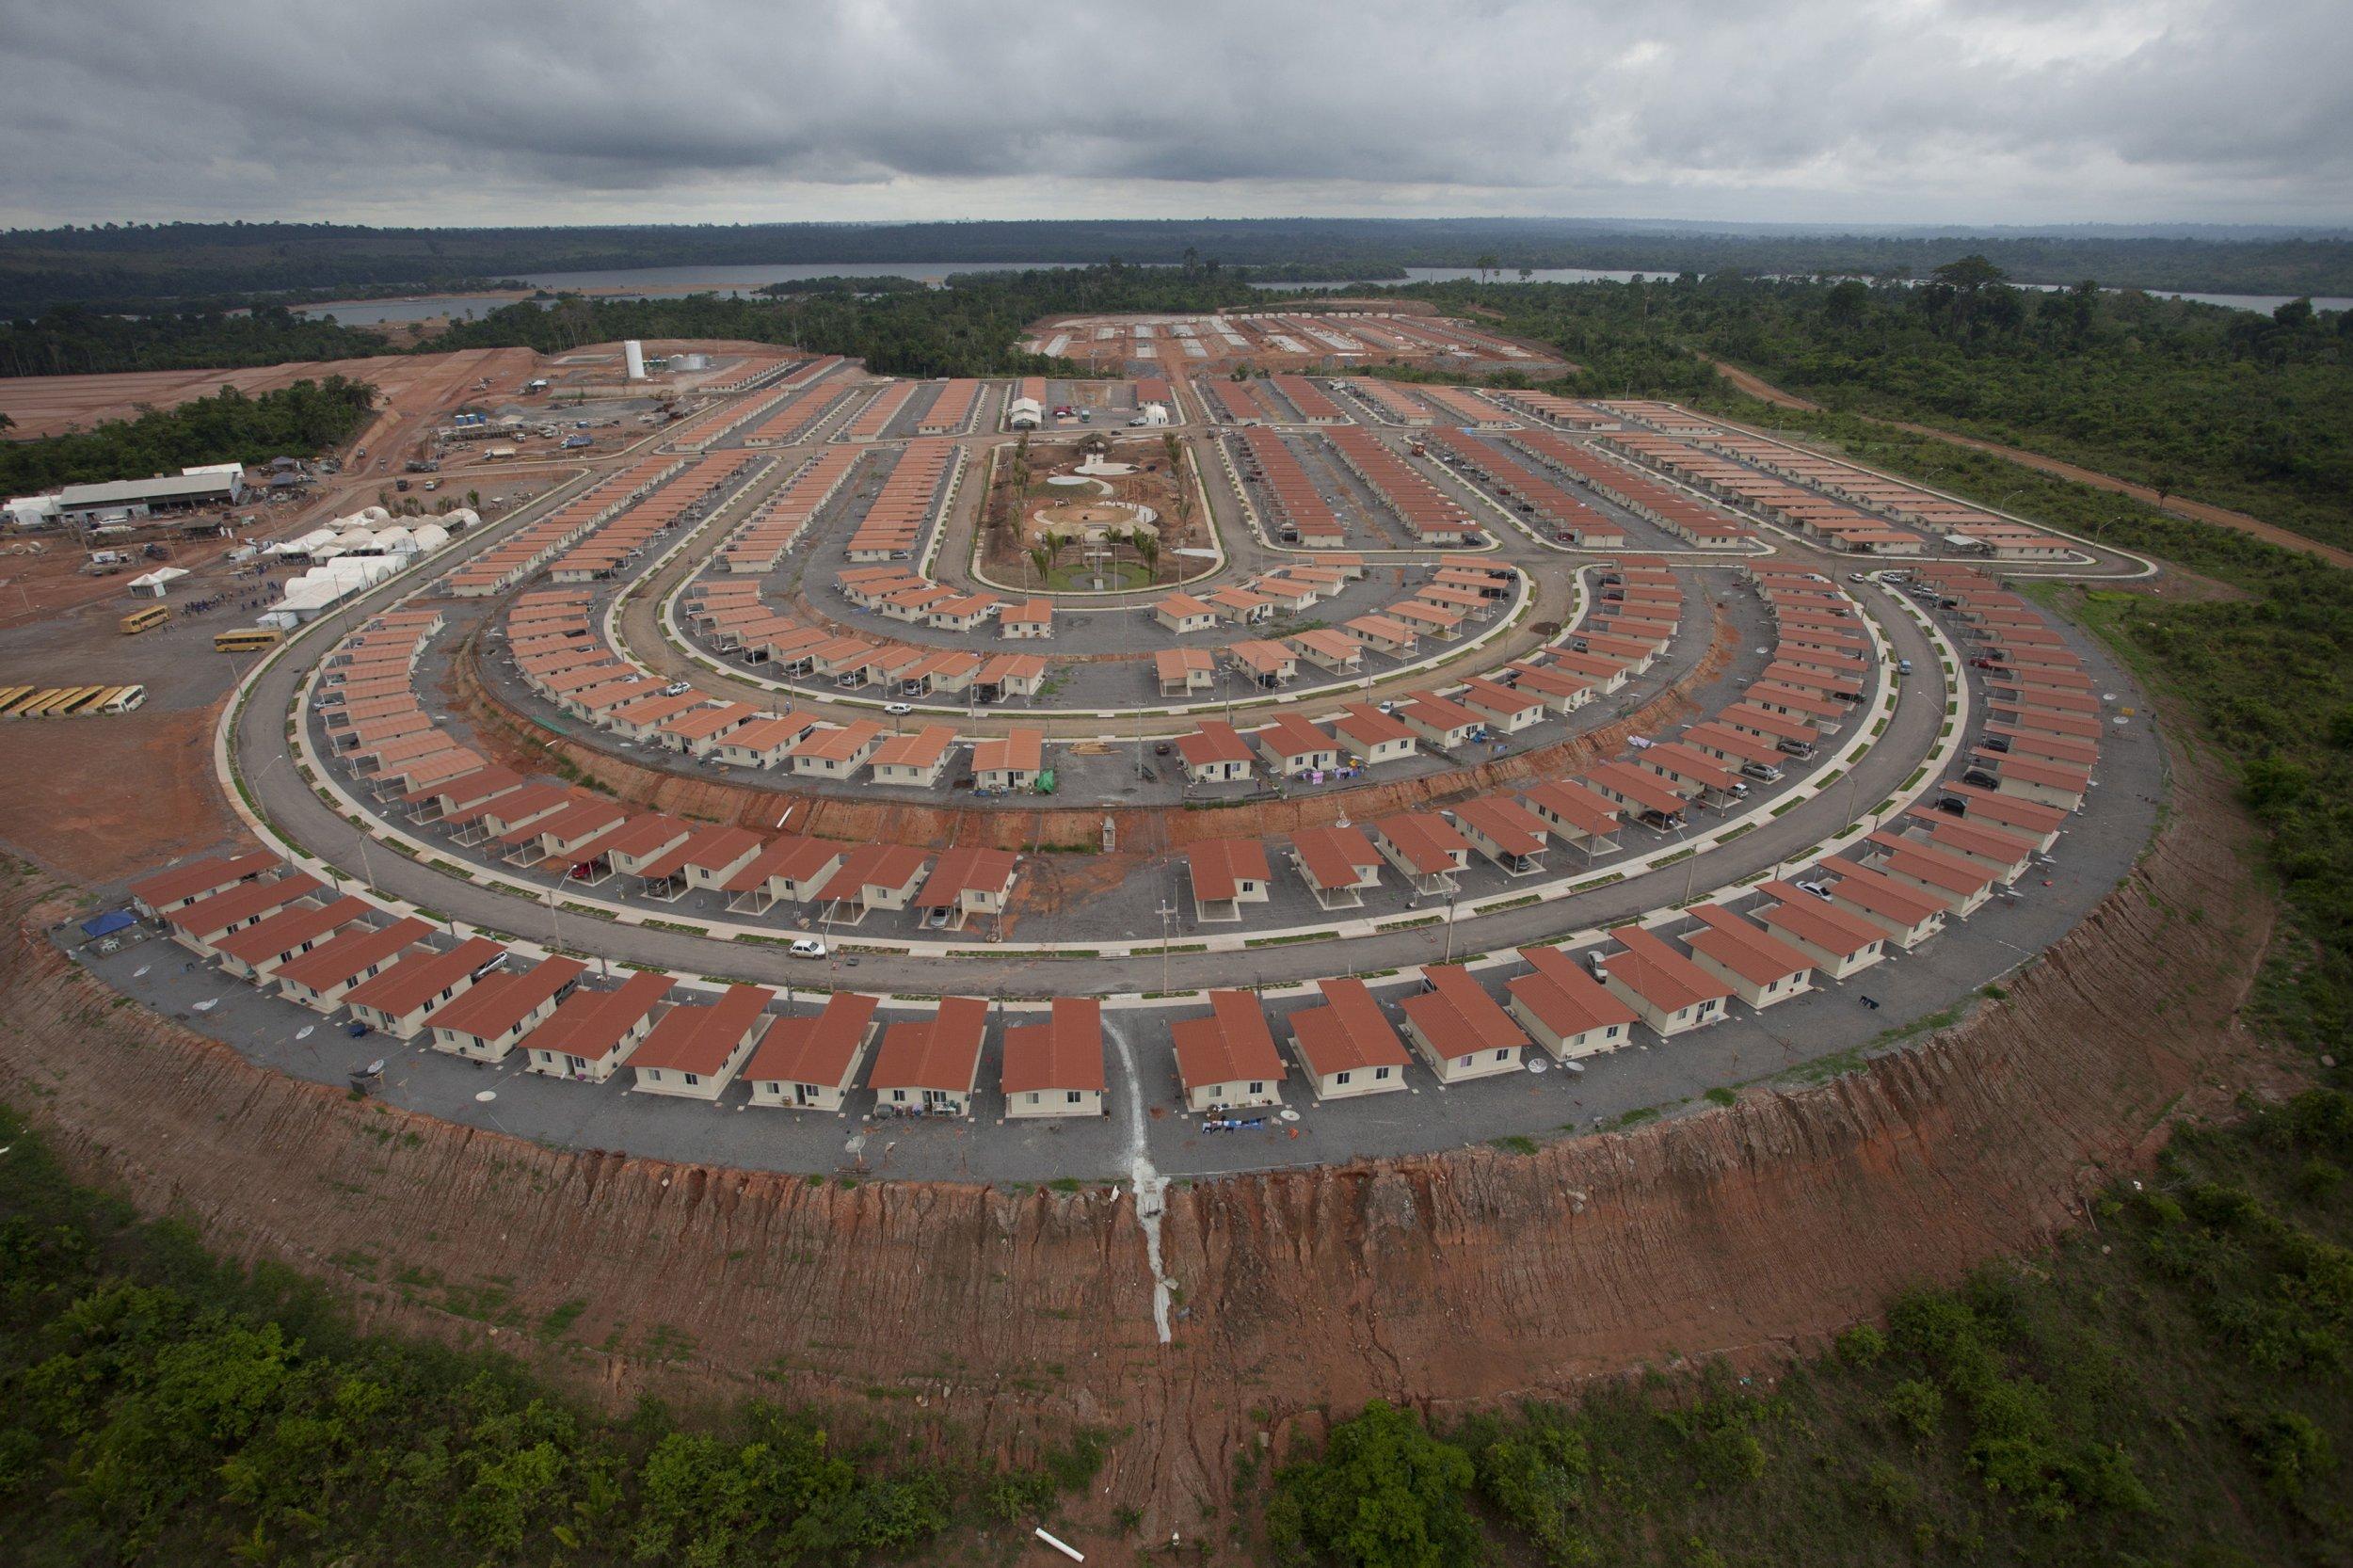 03_22_brazil_hydroelectric_dam_01